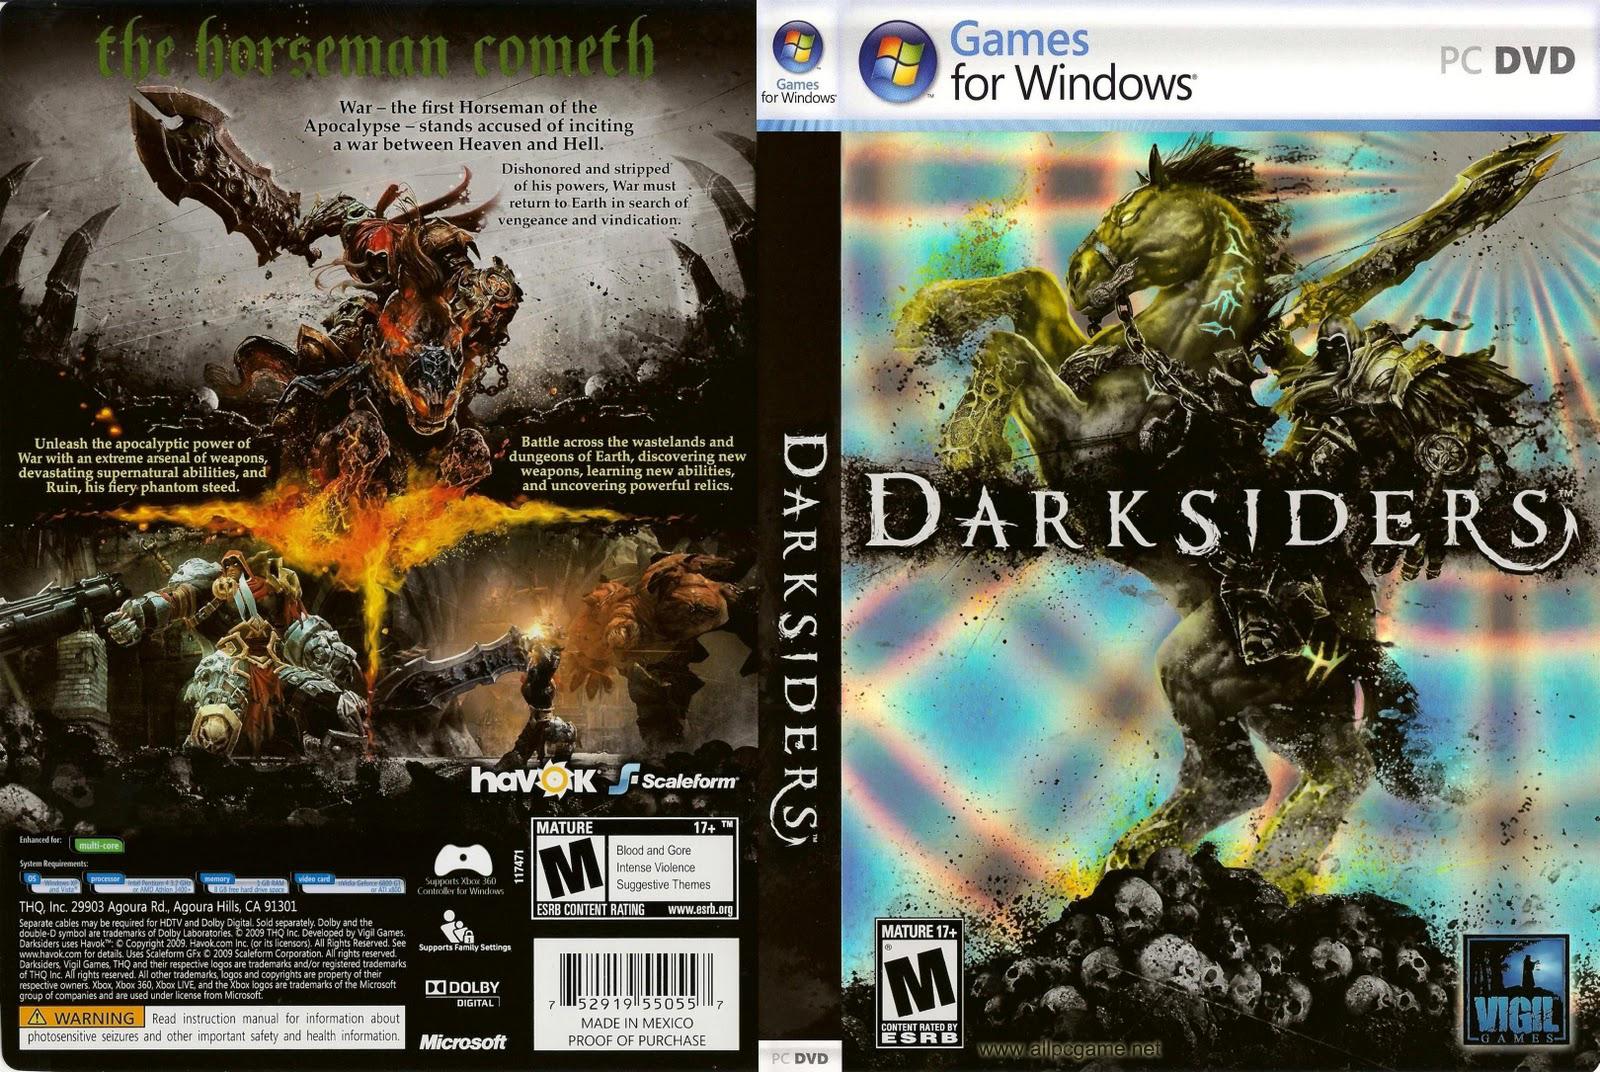 http://2.bp.blogspot.com/_3oLB6Otdlcs/TSeC5h8fU1I/AAAAAAAAJGk/QNeLhJtc5IY/s1600/darksiders_2010_dvd-front_back.jpg